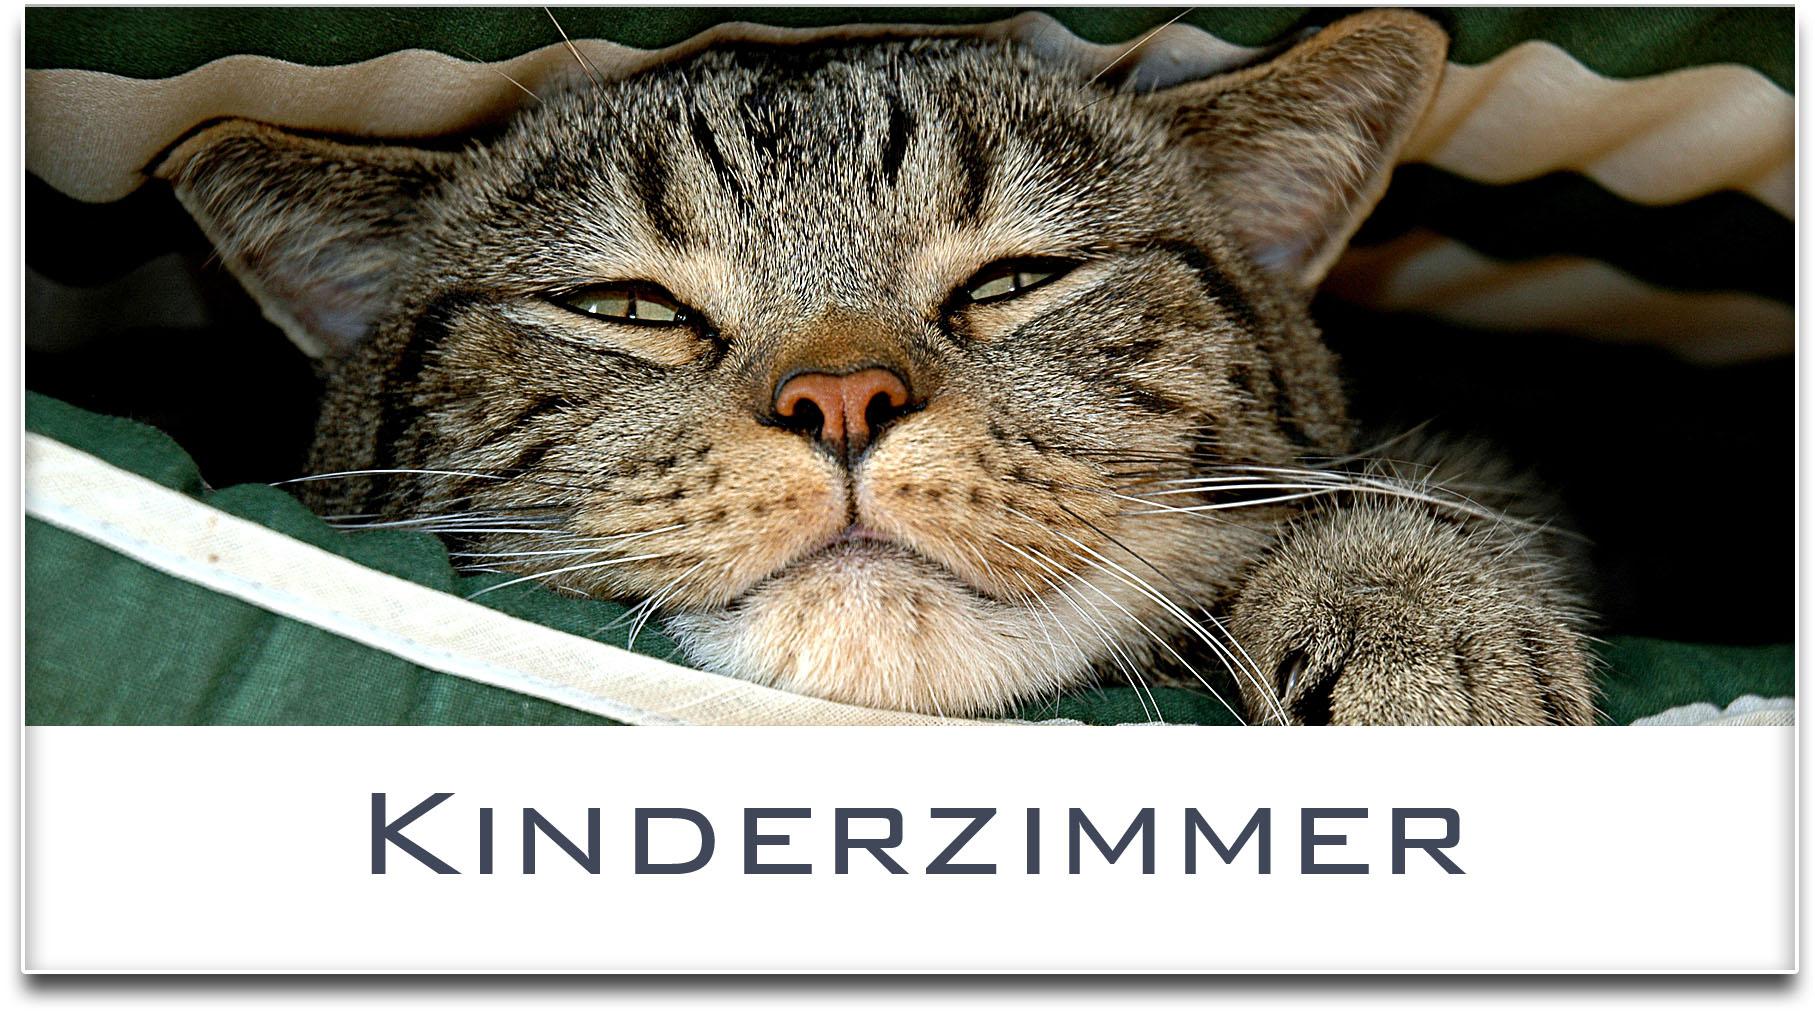 Türschild / Haustürschild / Katze / Kinderzimmer / Selbstklebend